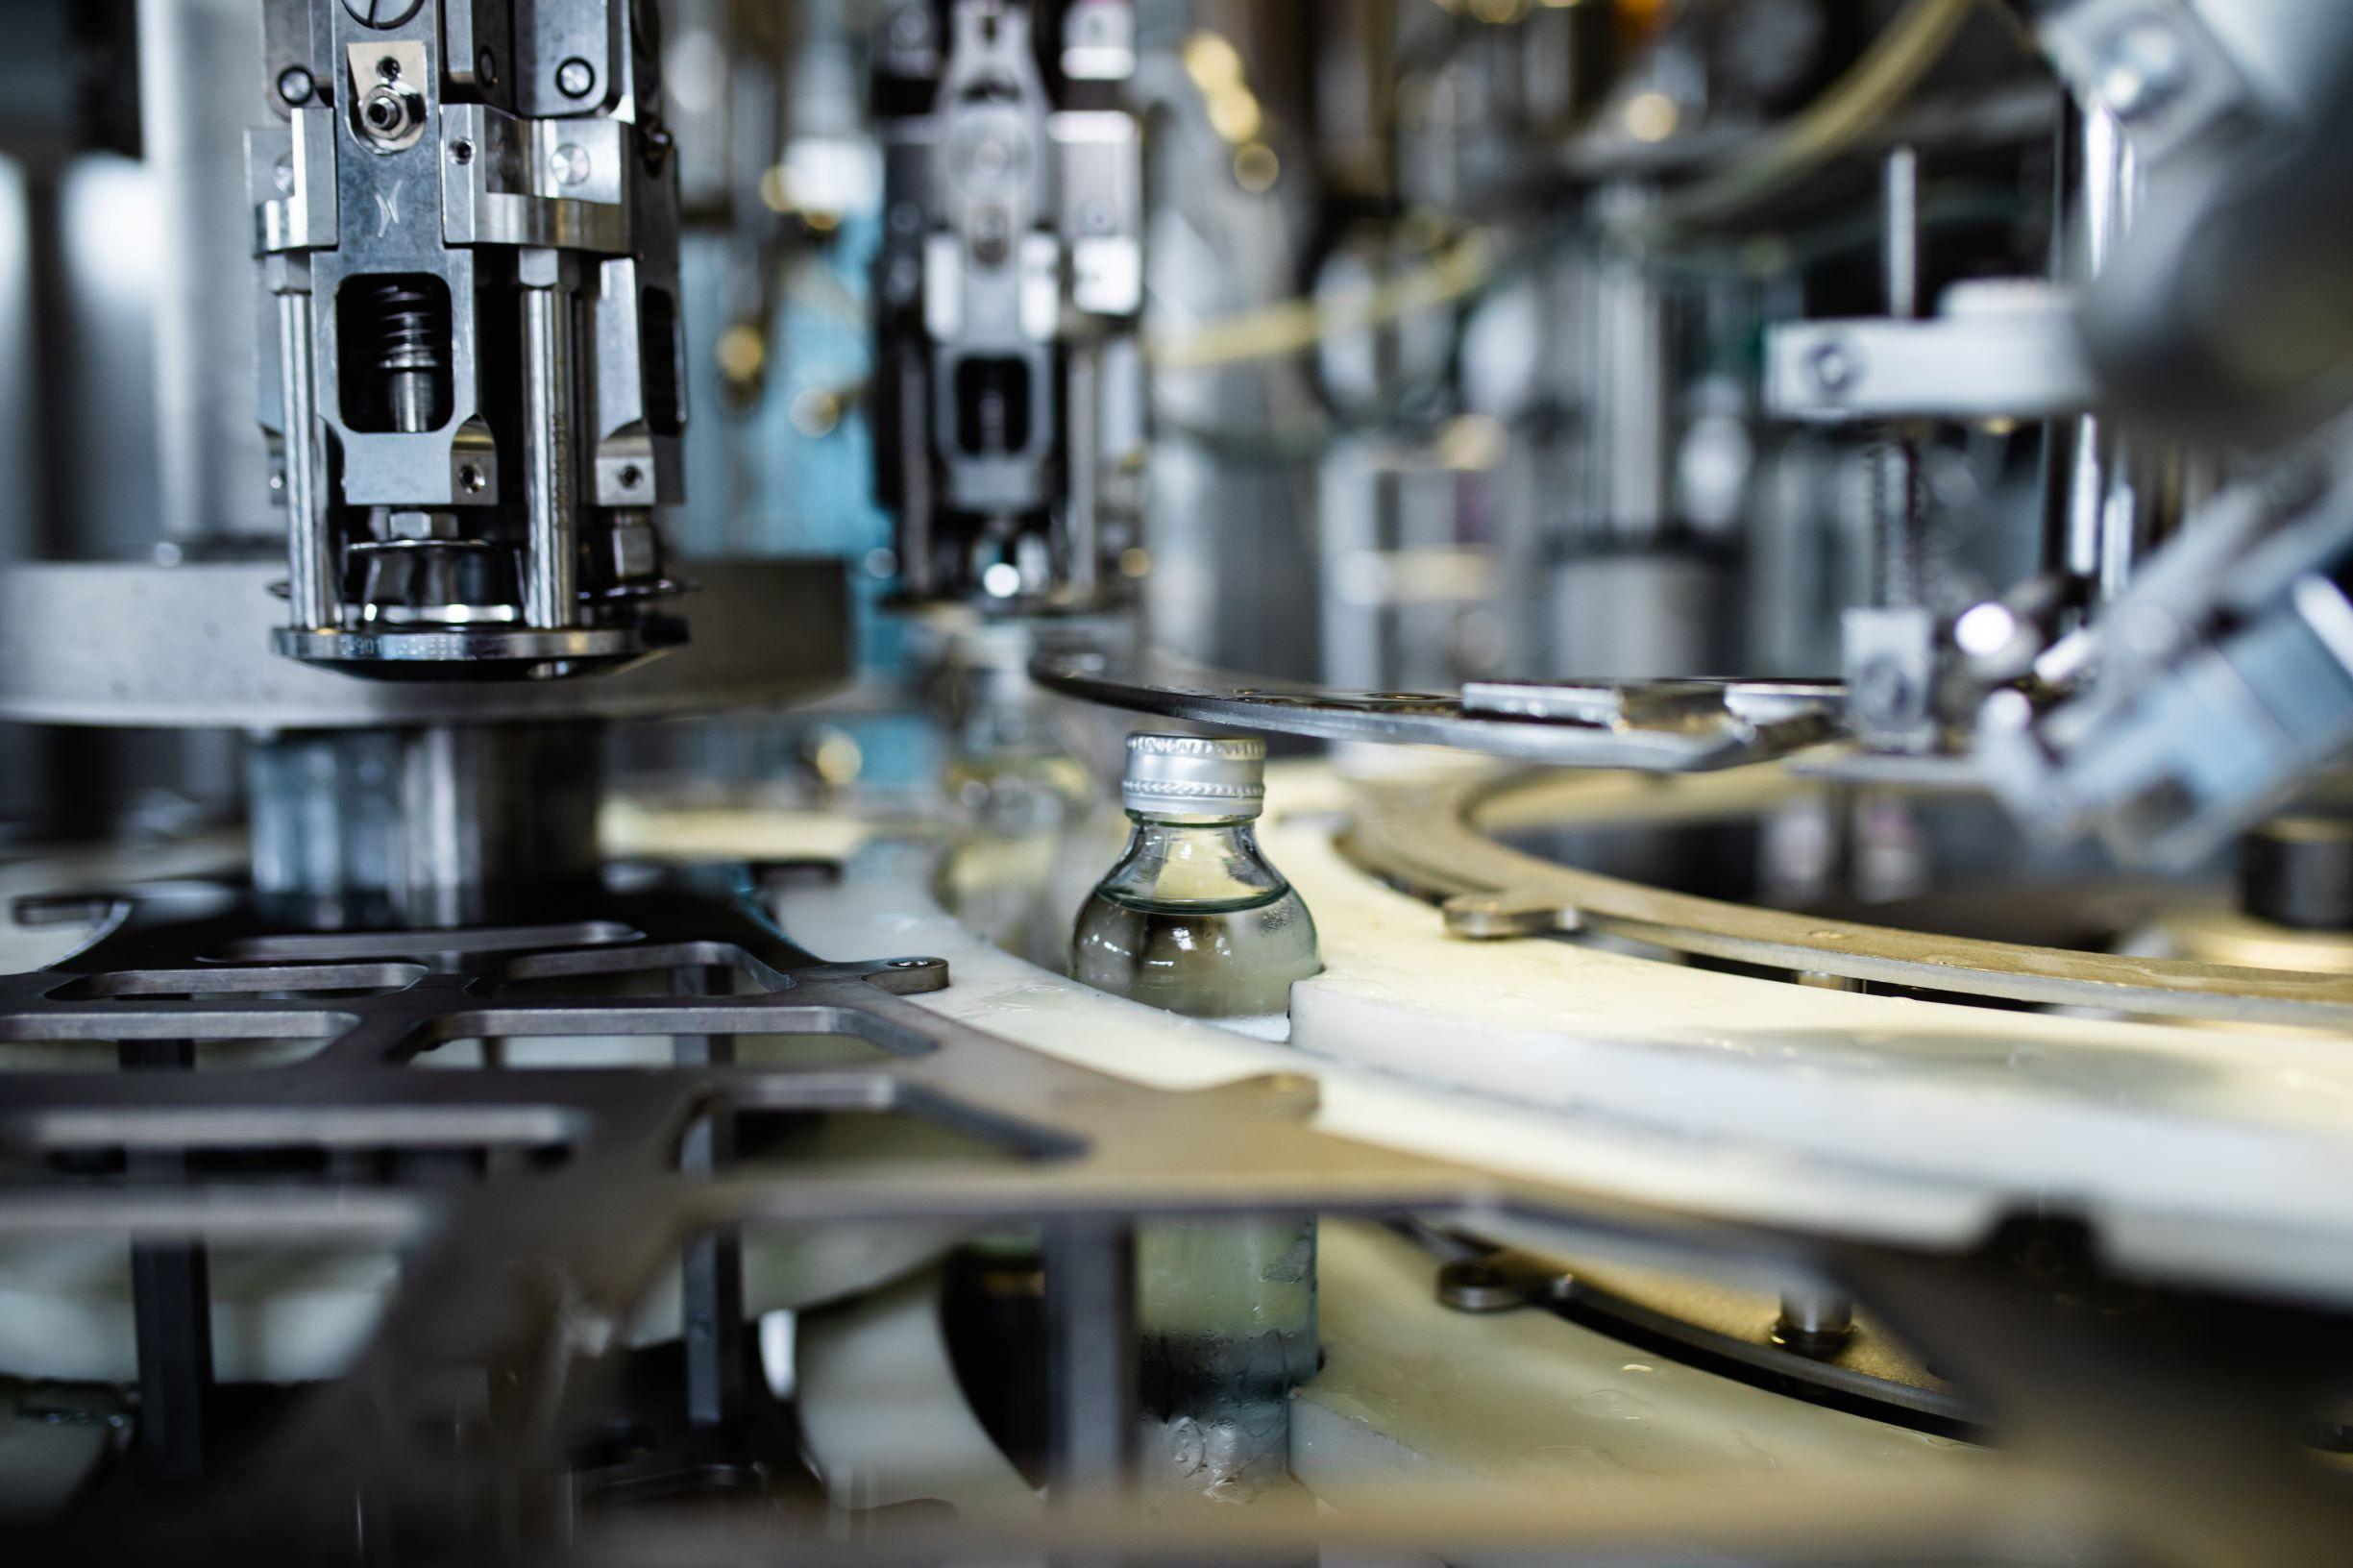 Industrial machinery and equipment repair and maintenance